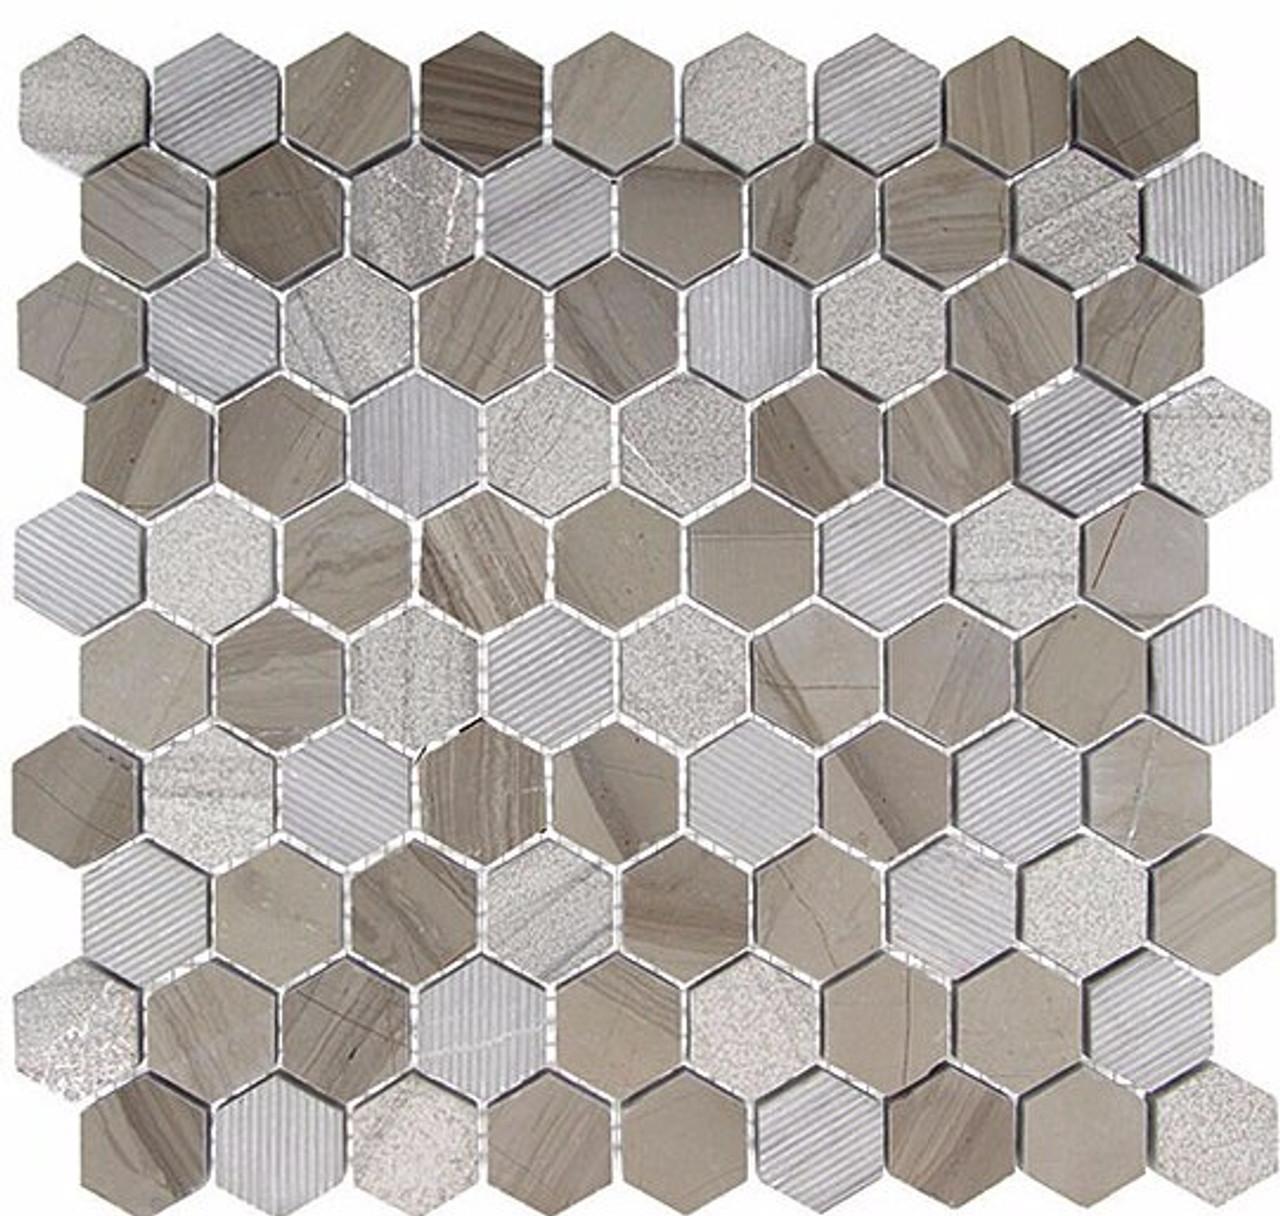 Bella Glass Tiles Excalibur Smokey Tan